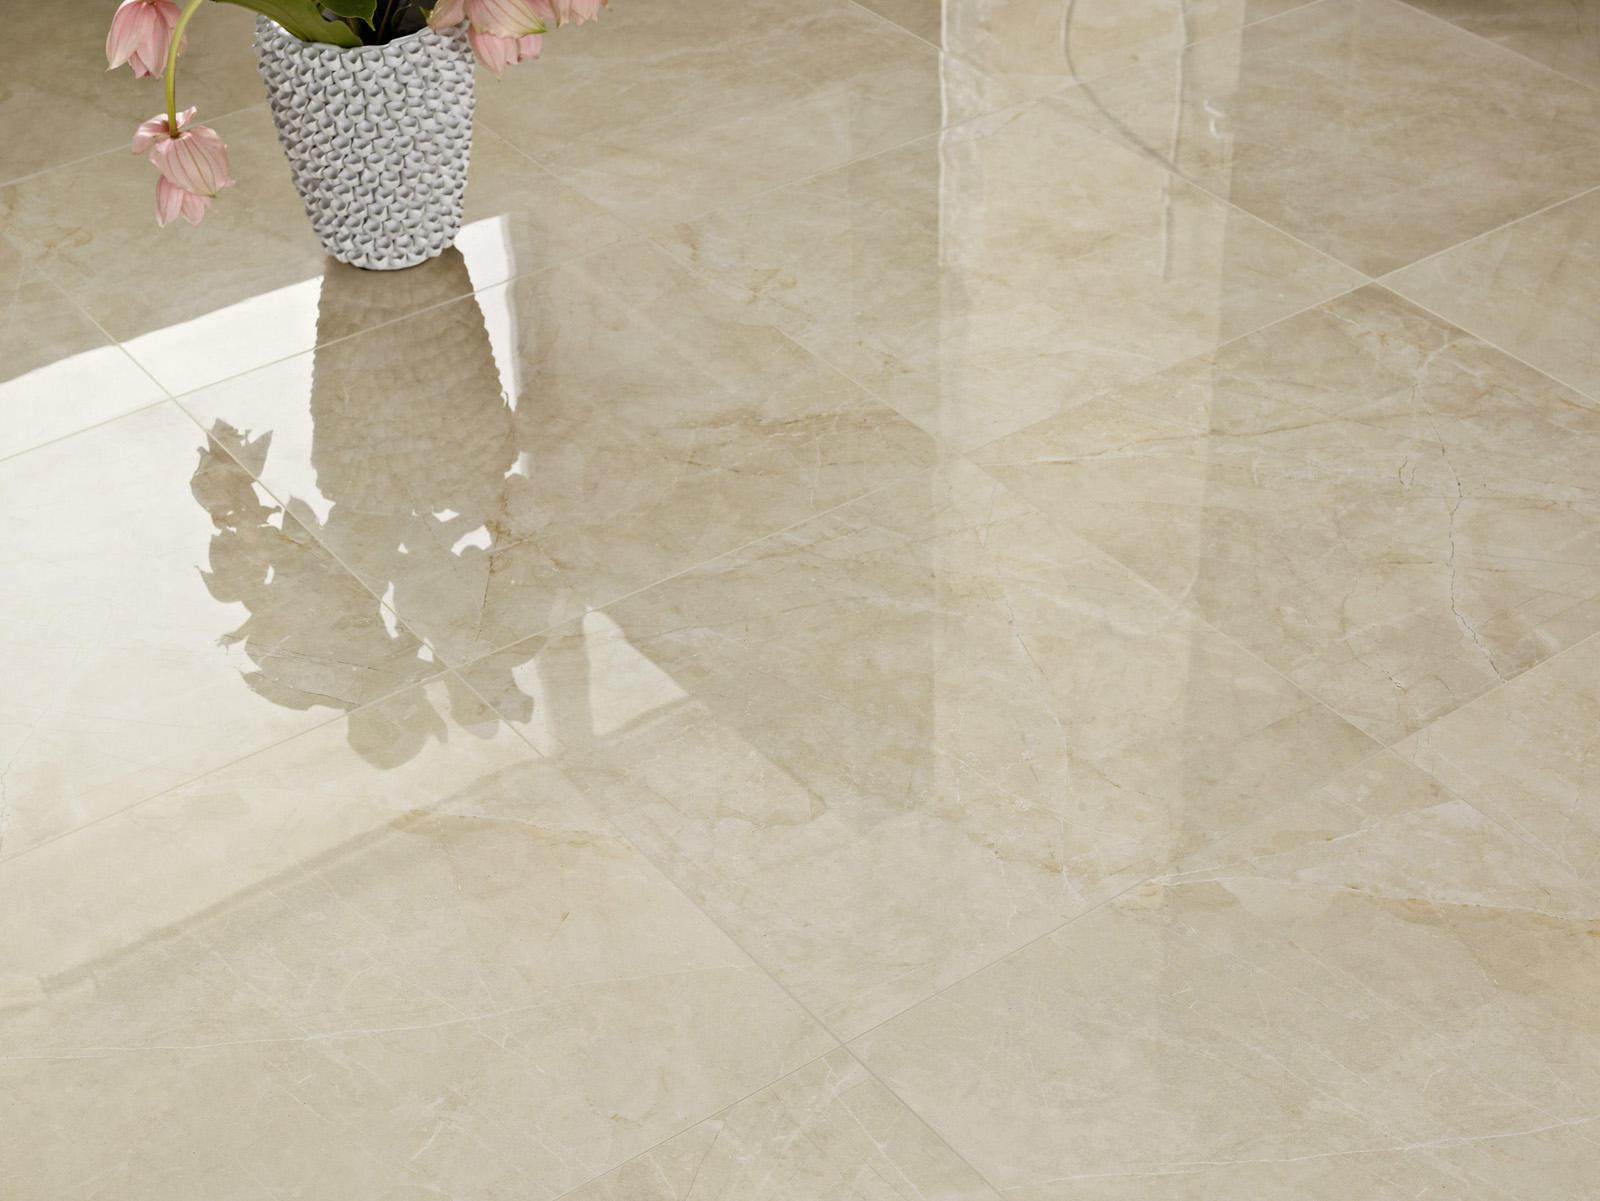 evolutionmarble lux tafu grey floor tiles from marazzi. Black Bedroom Furniture Sets. Home Design Ideas